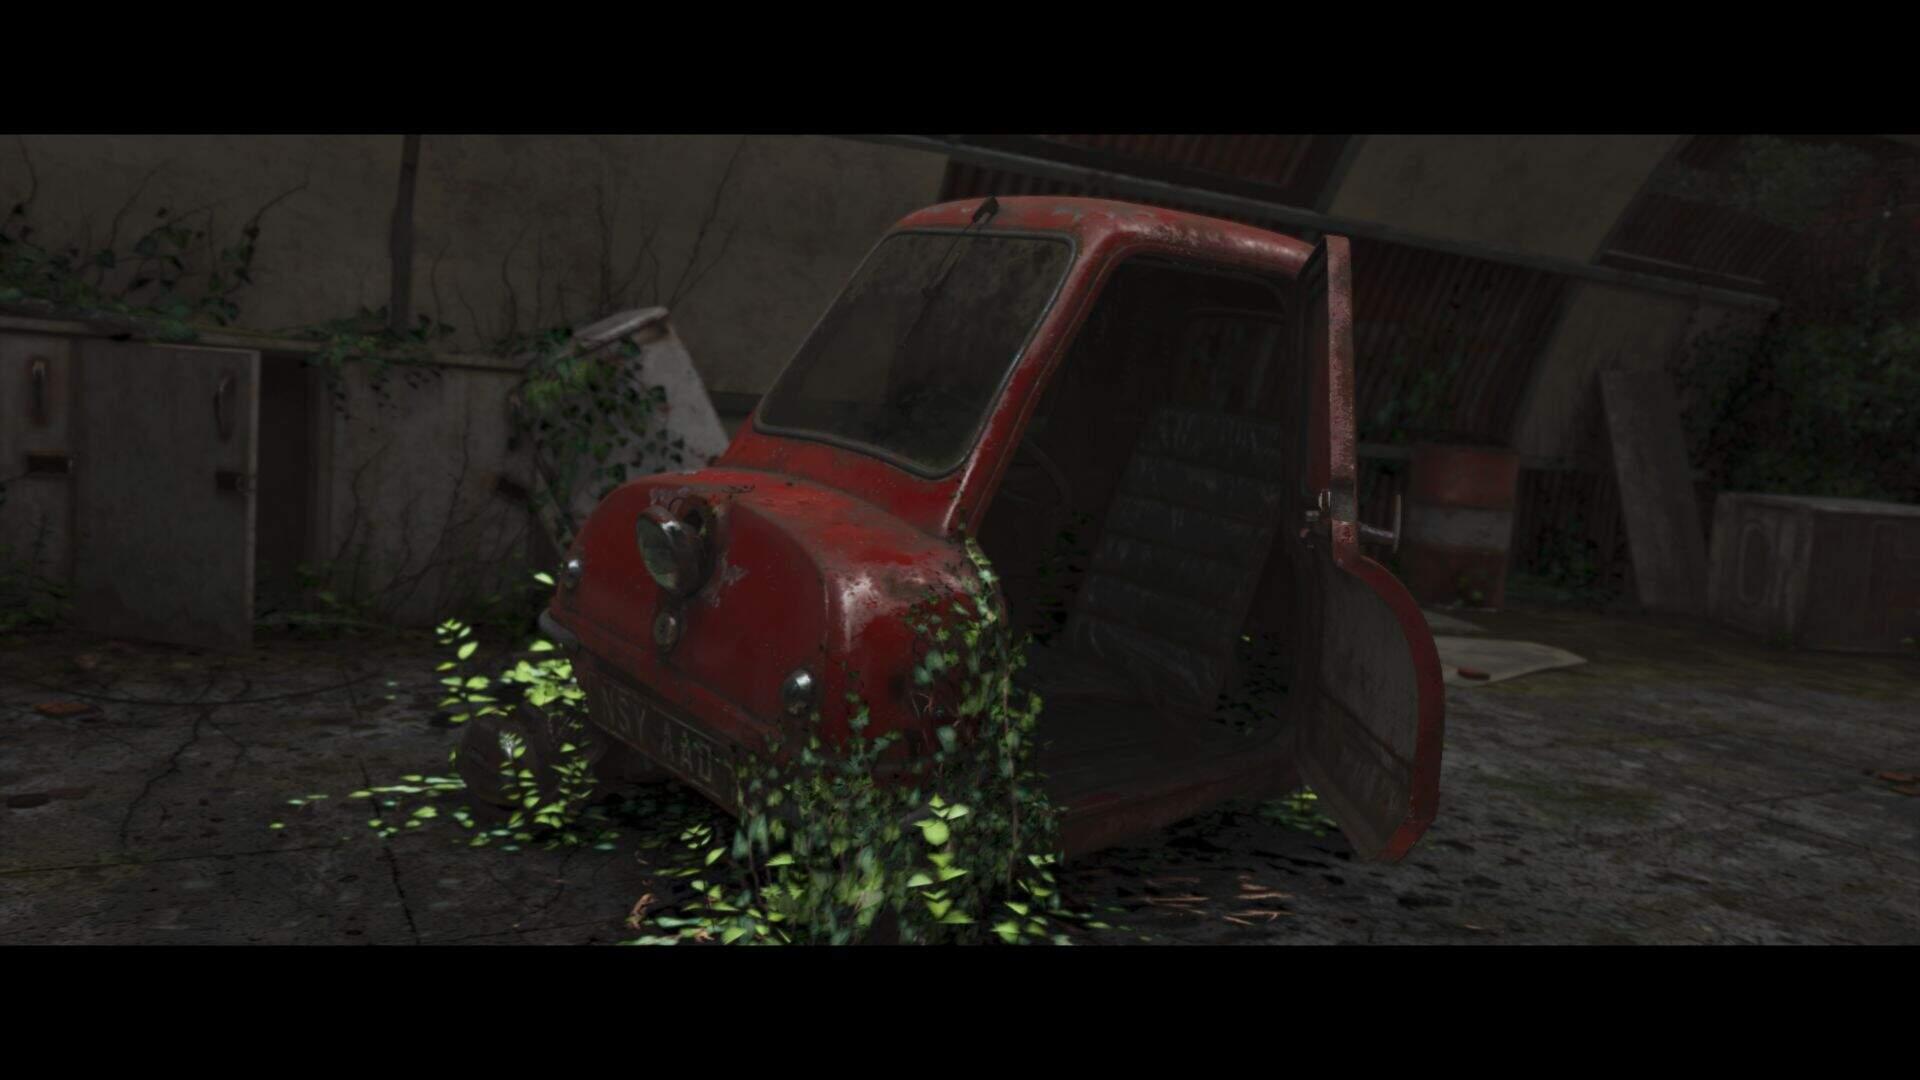 Forza Horizon 4 Peel P50 Scheunenfund